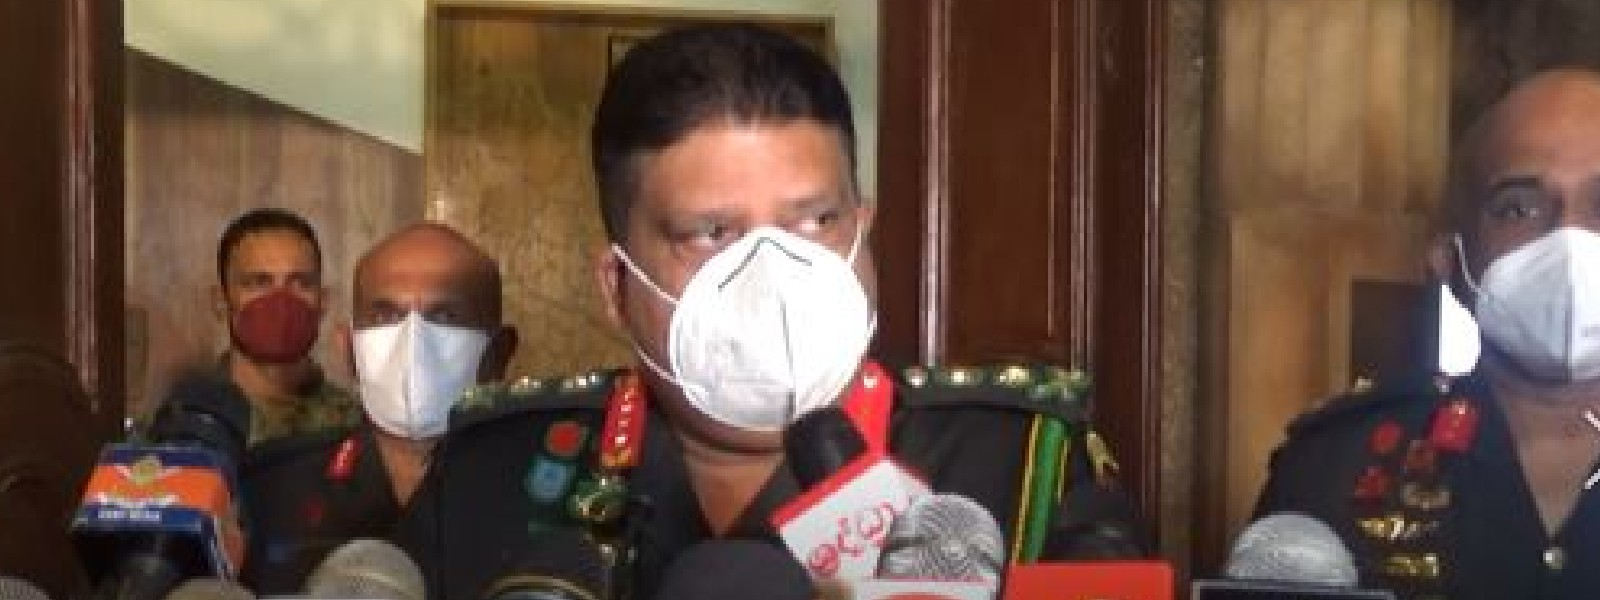 'Don't criticize Army vaccination drive' – Commander responds to Ranil